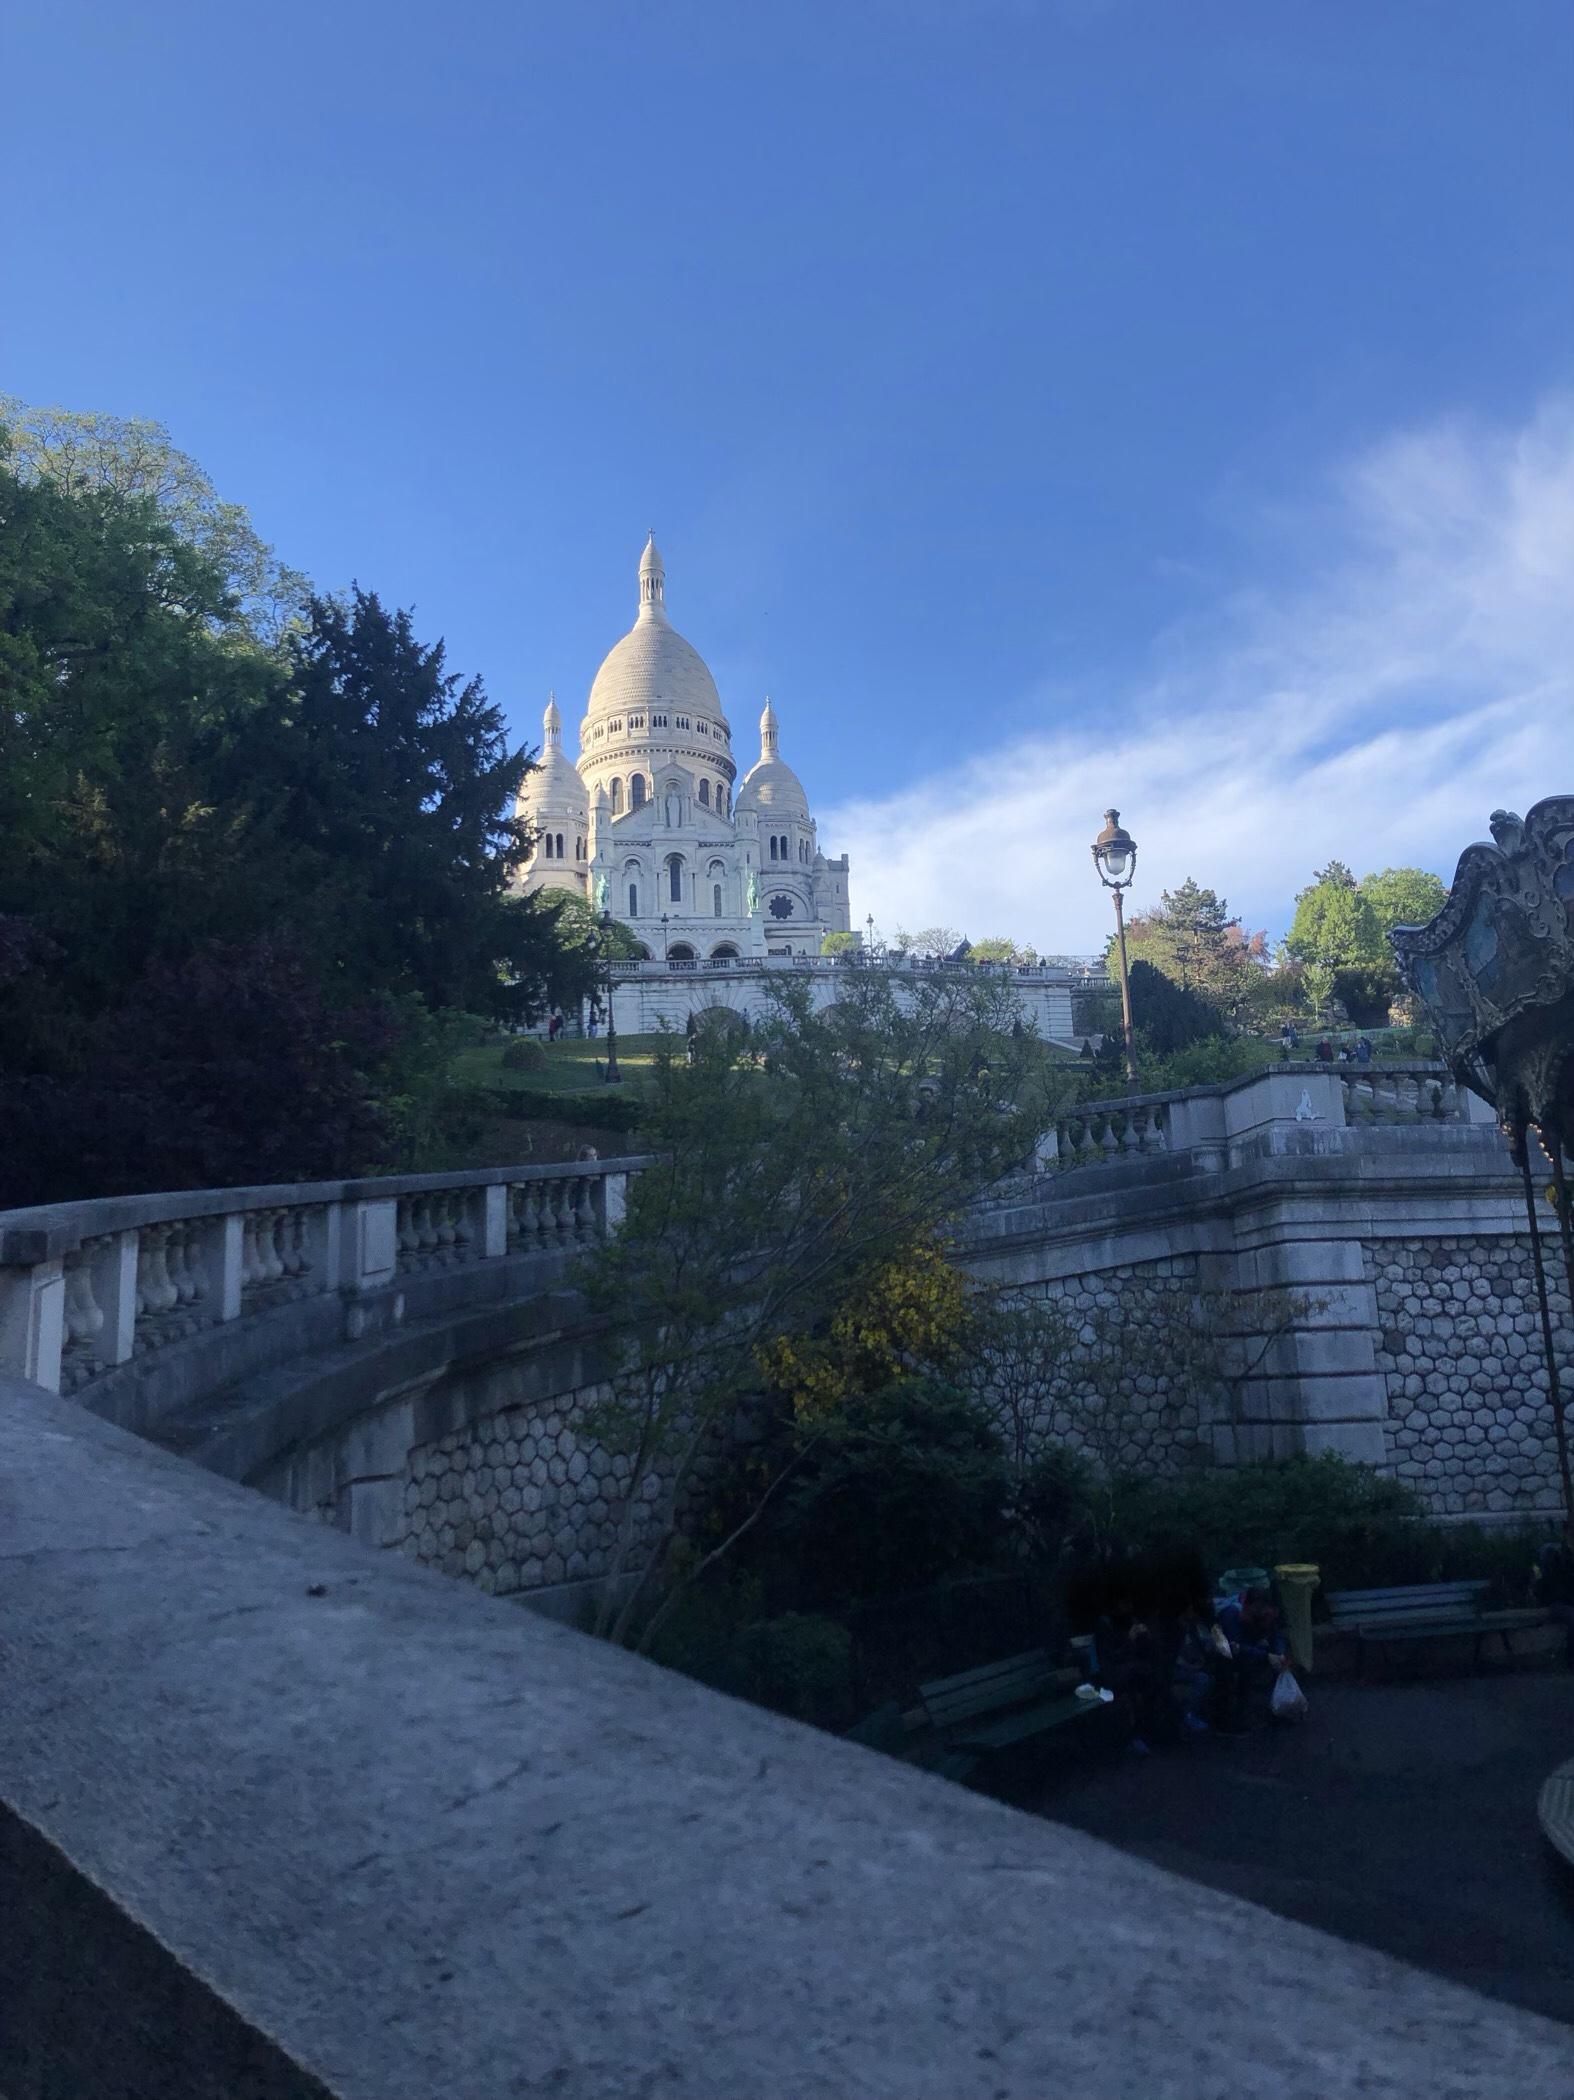 Die Basilika, Sacré-Coeur aus dem 18. Arrondissement von Paris, auf dem Monmartre